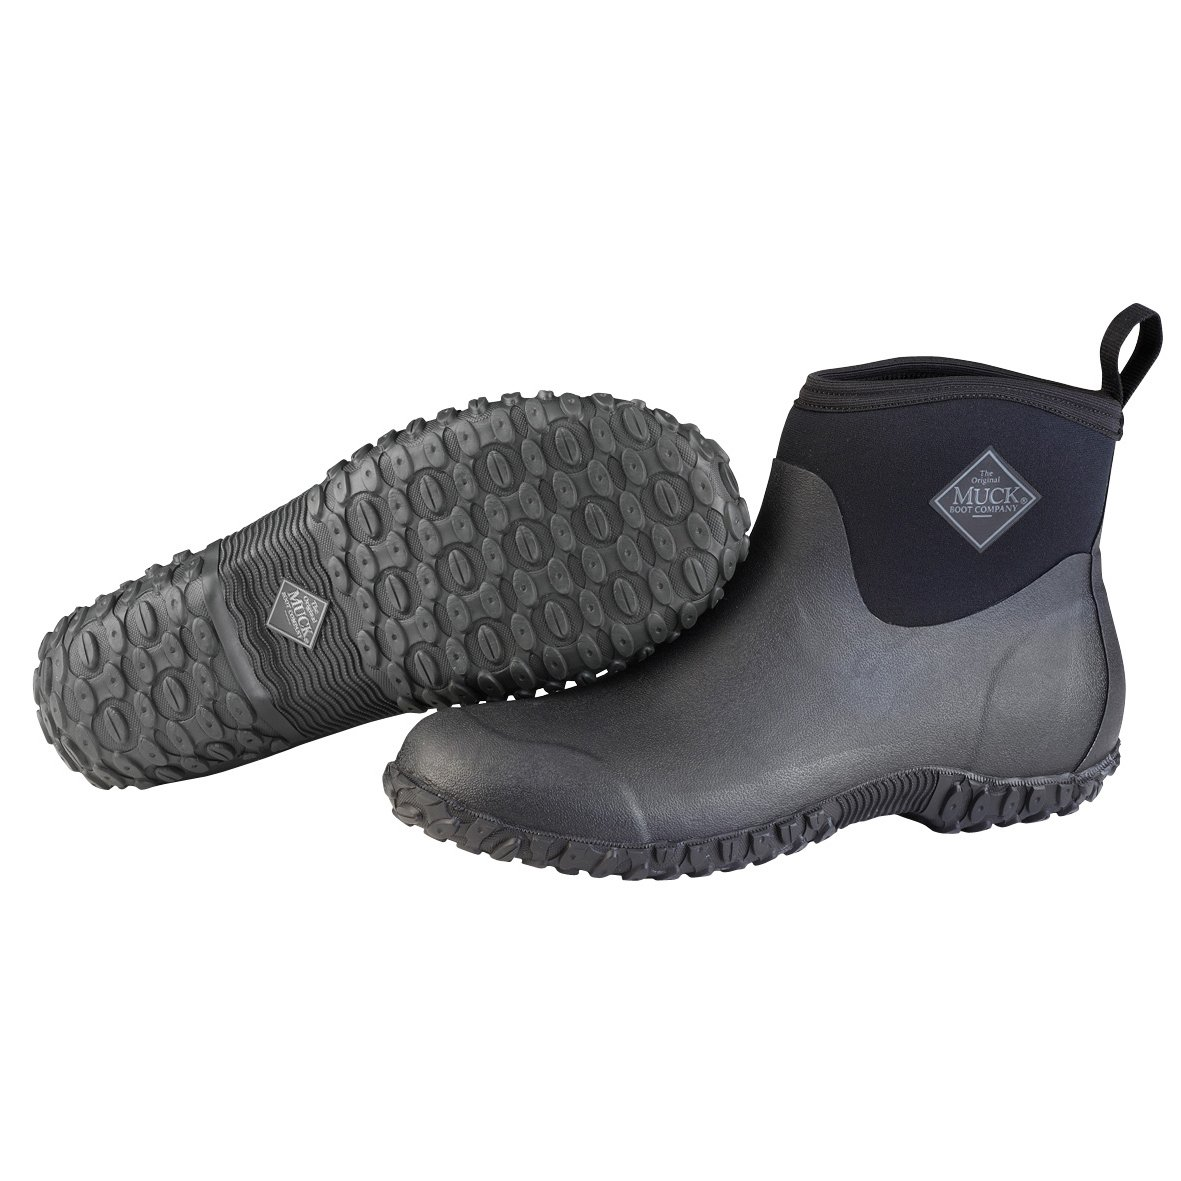 Muckster ll Ankle-Height Men's Rubber Garden Boots,Black,7 M US